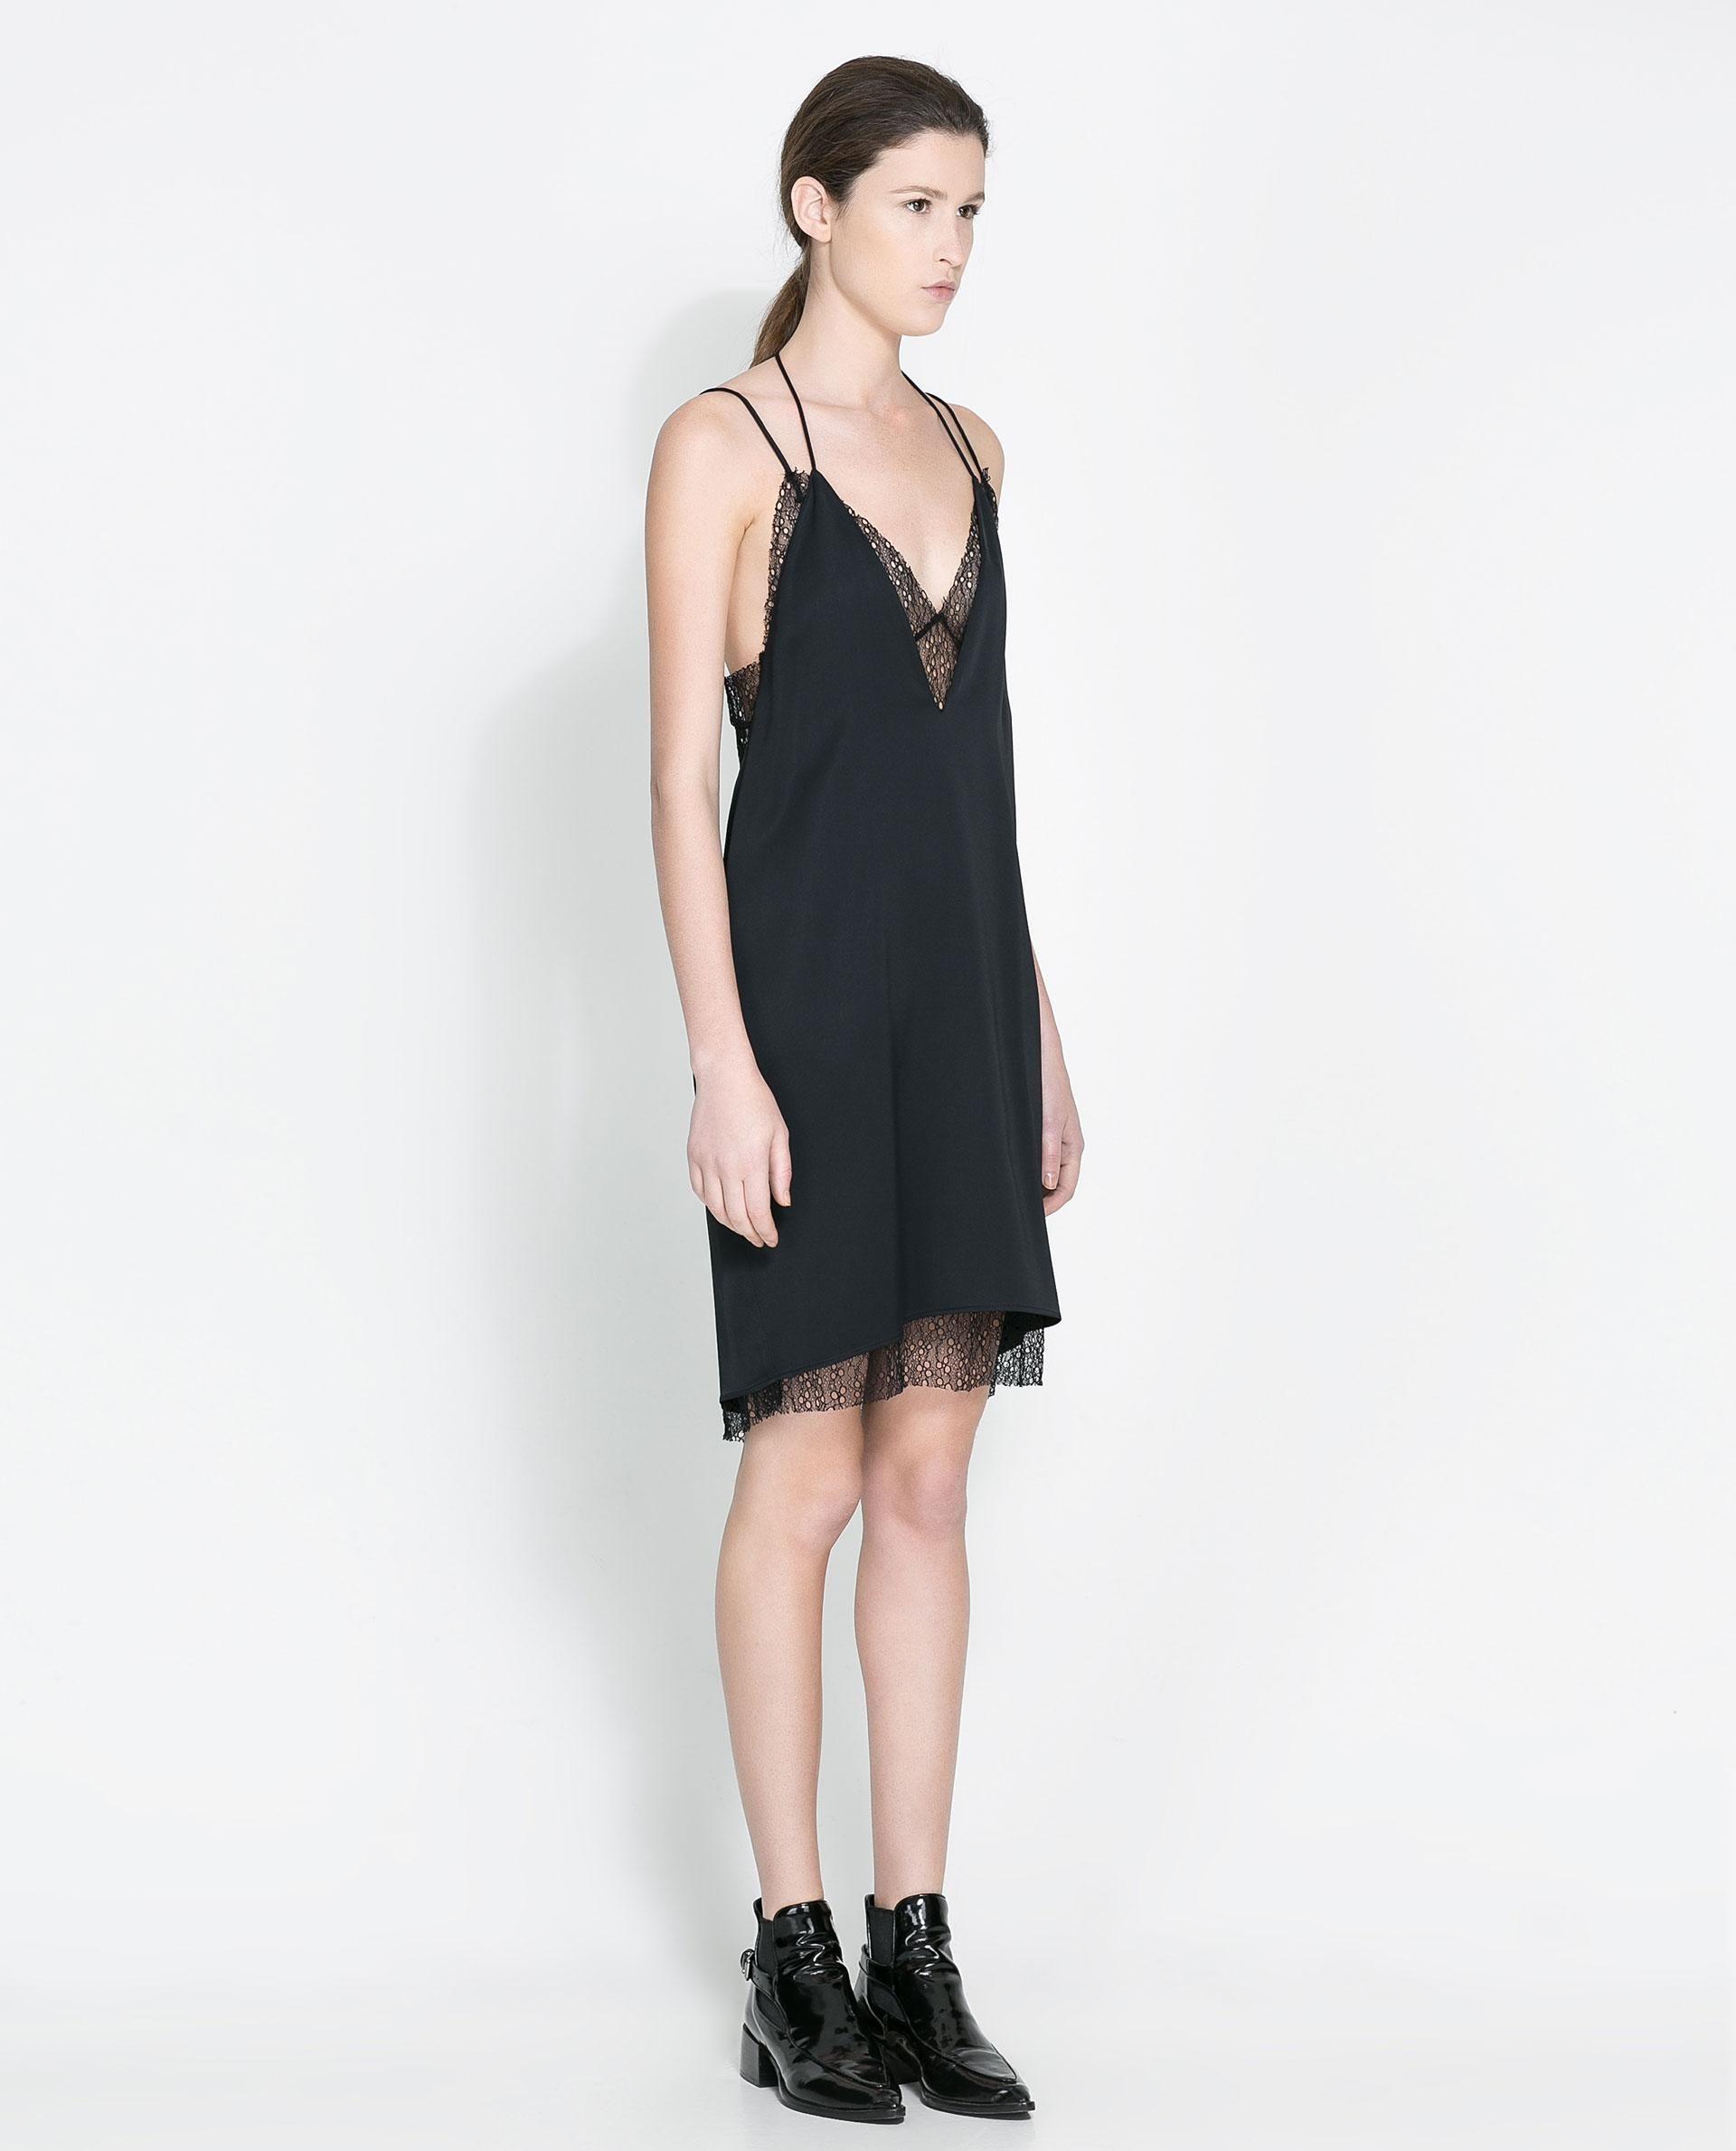 e3cb3210 Zara Studio Mesh Dress | Effortless Style | Fashion, Zara dresses ...